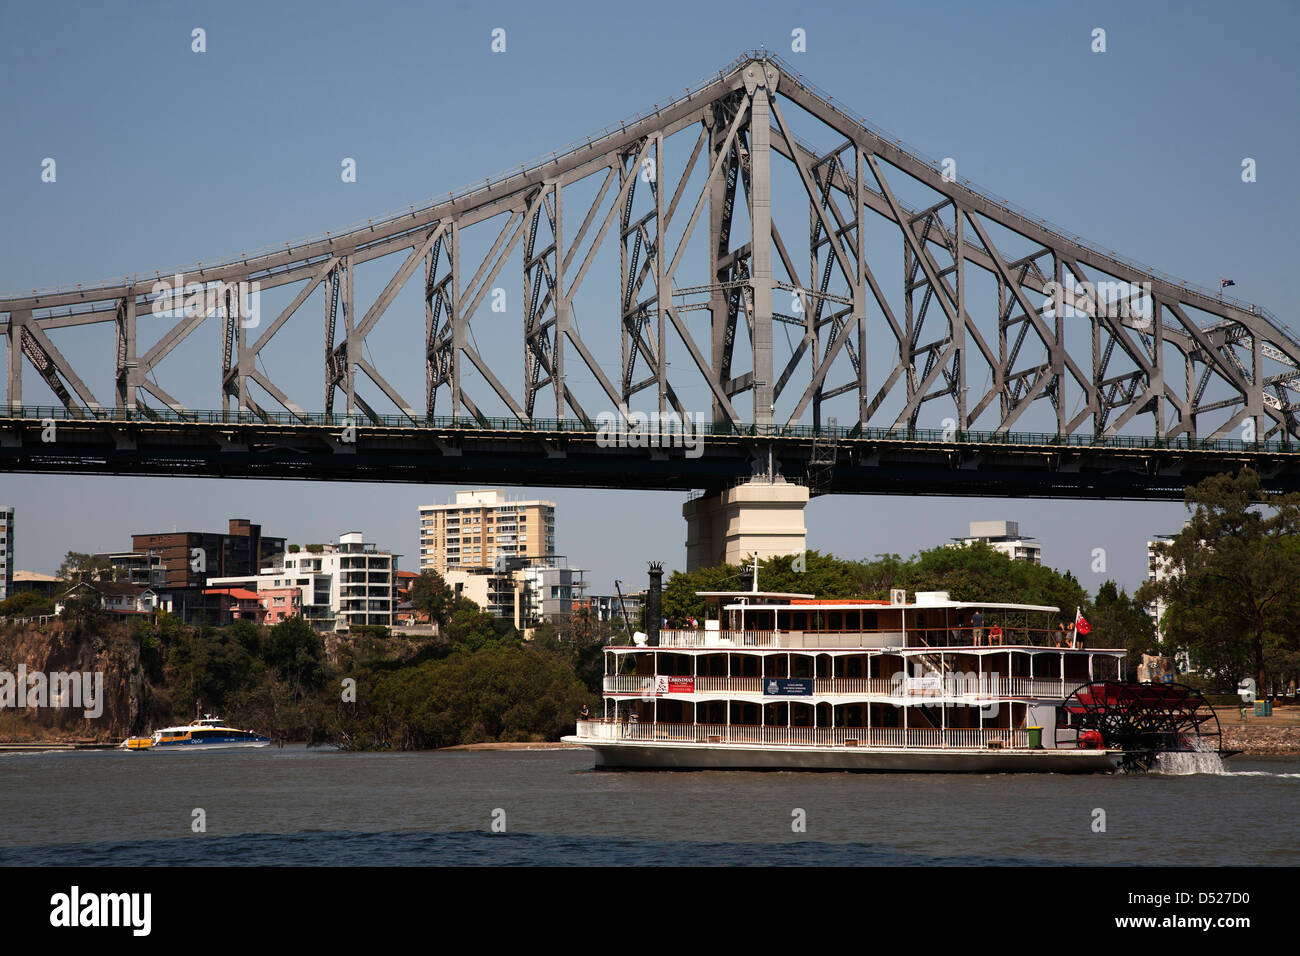 Tourist Paddle Boat on the Brisbane River passing under the Storey Brisbane Queensland Australia - Stock Image